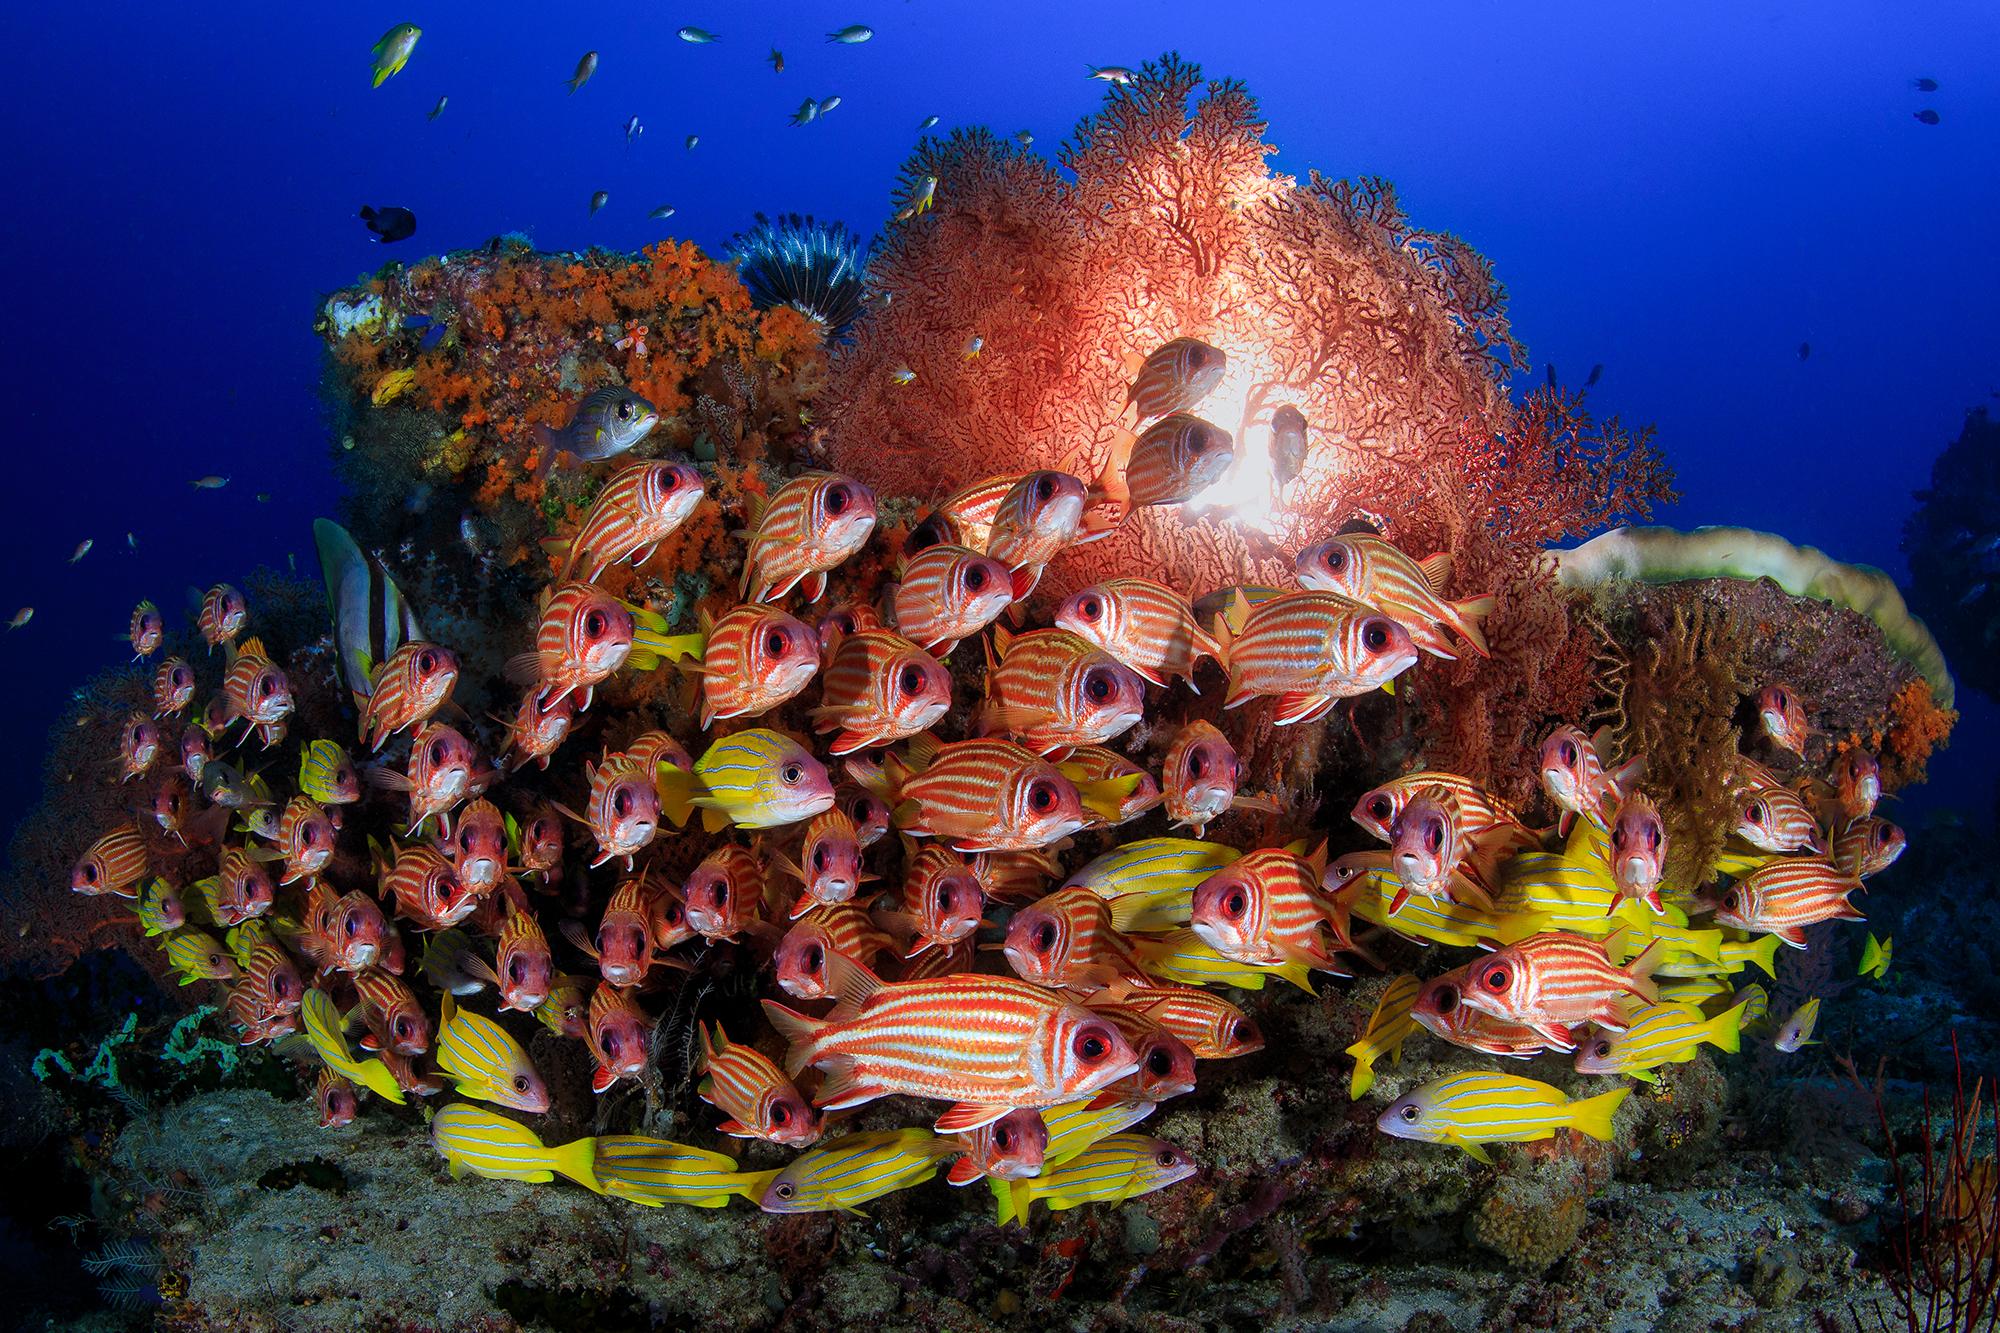 A SCHOOL of SQUIRREL FISH in raja ampat CREDIT: YEN-YI LEE / coral reef image bank